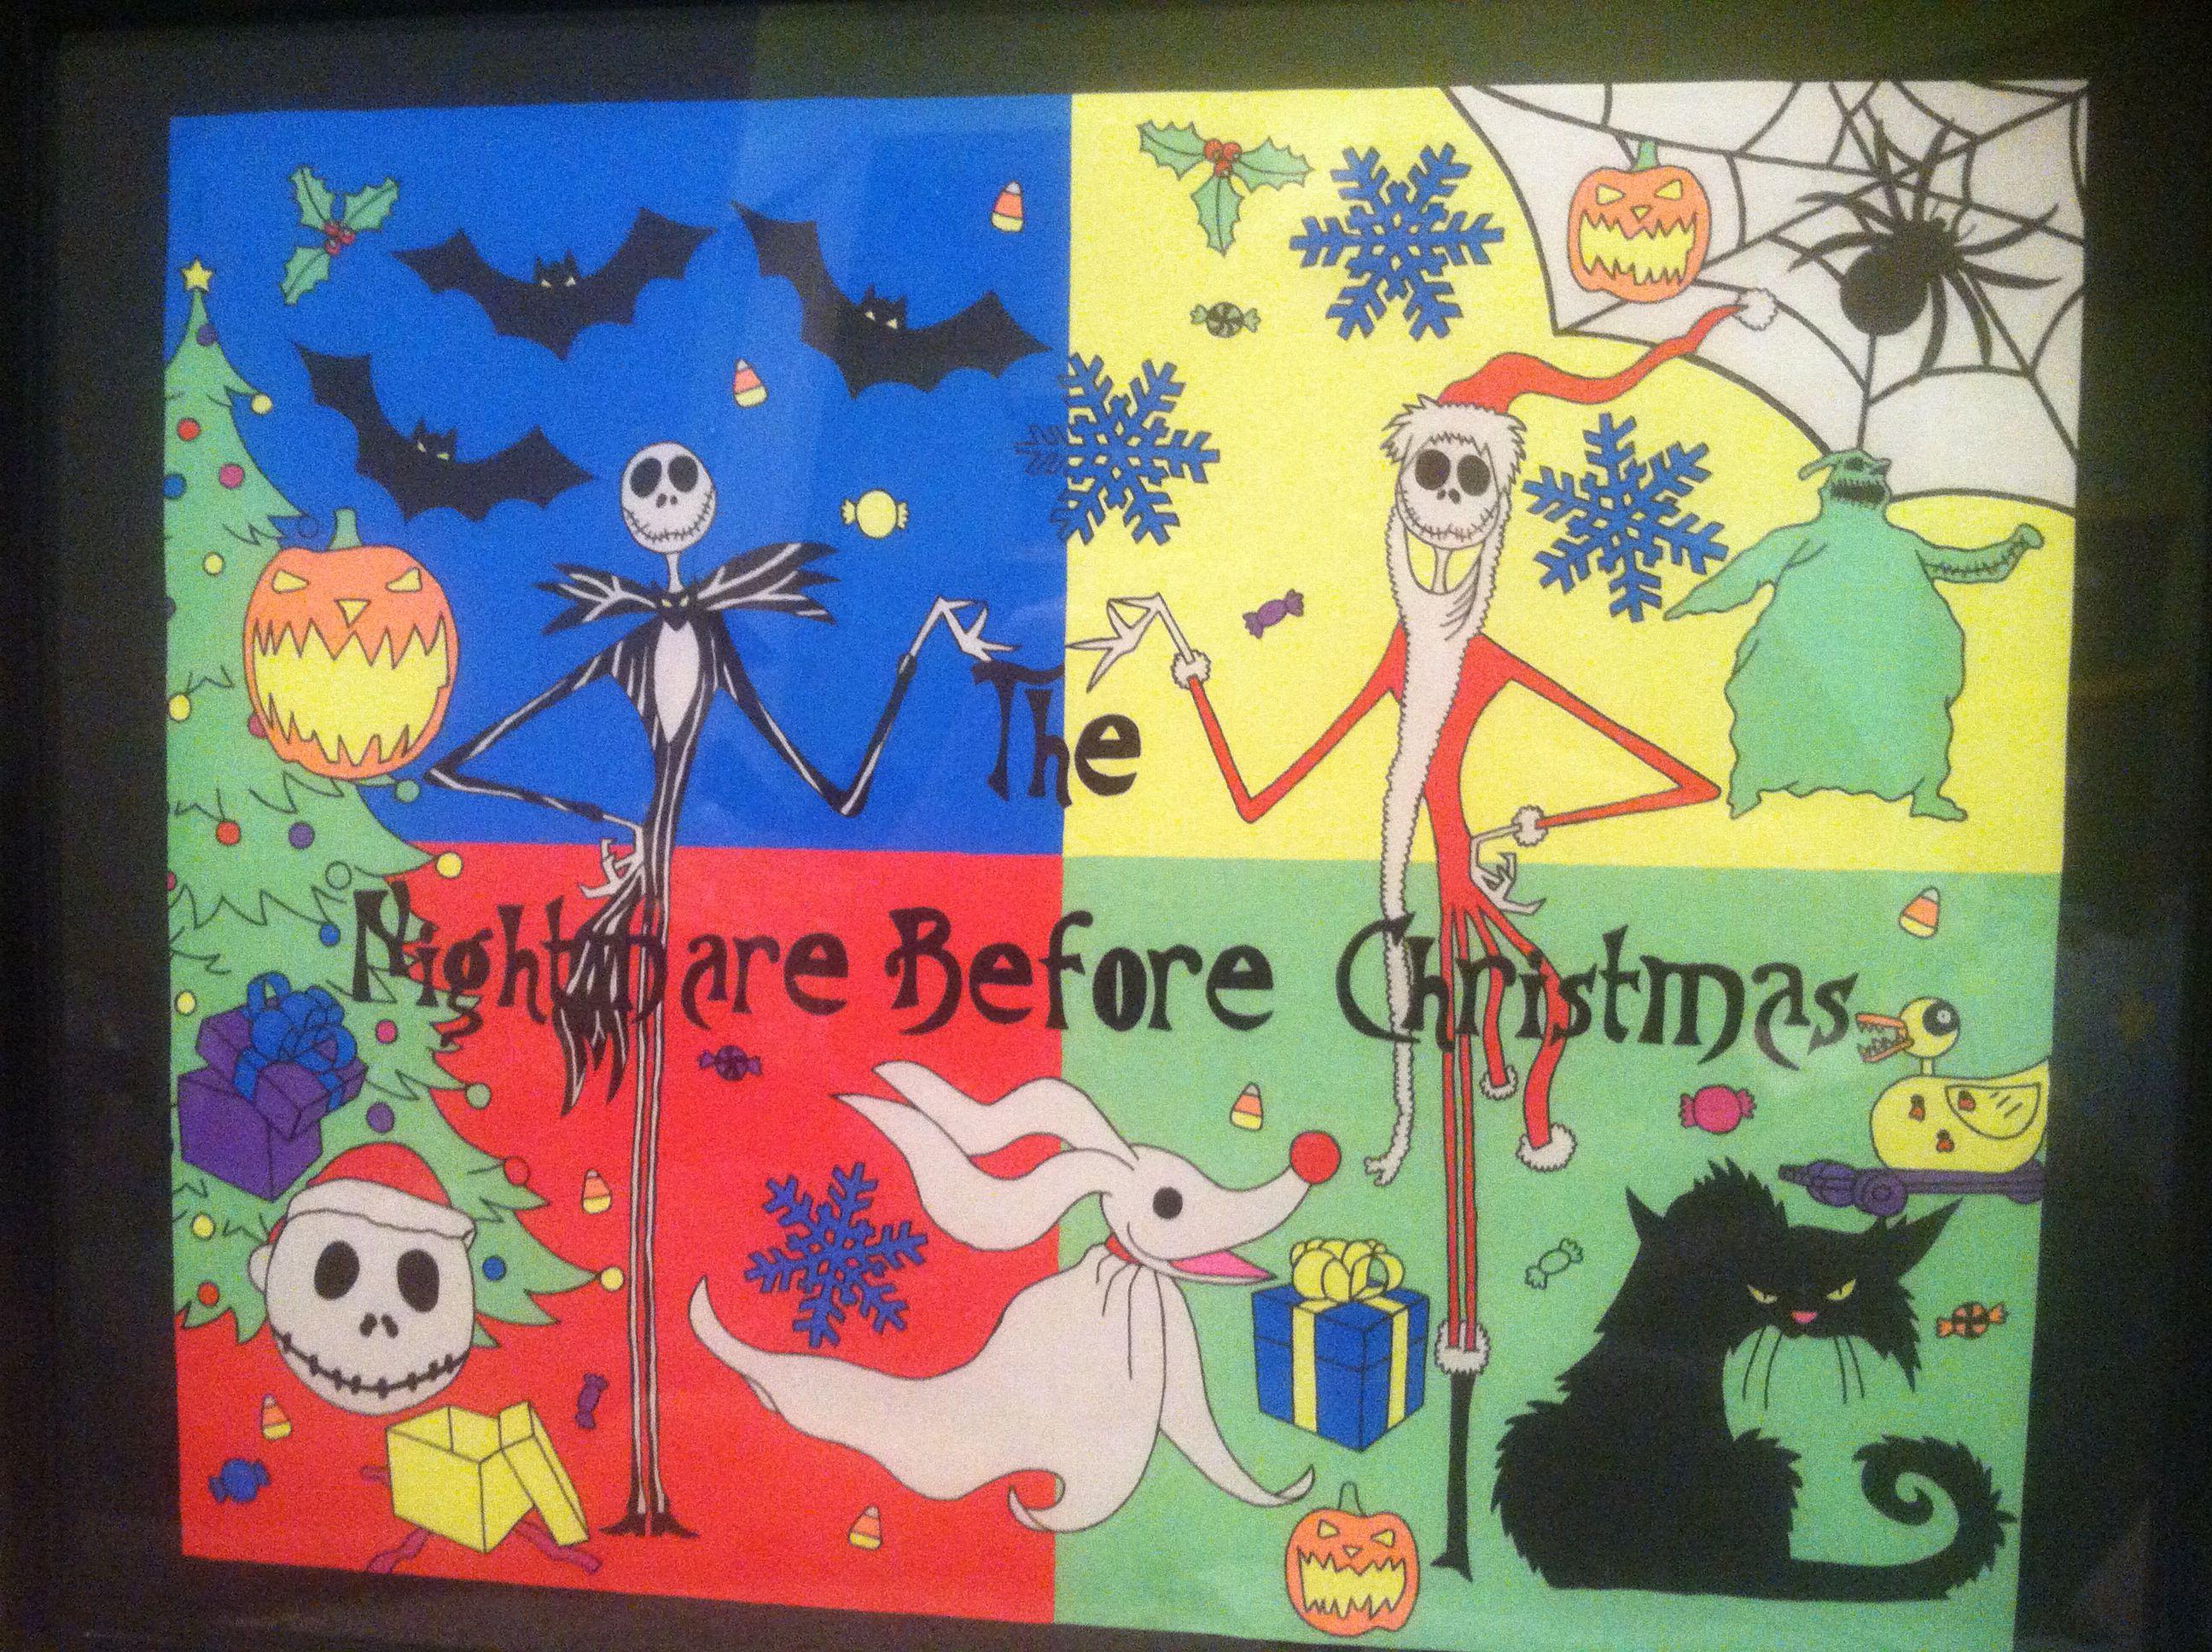 The Nightmare Before Christmas Regular Light